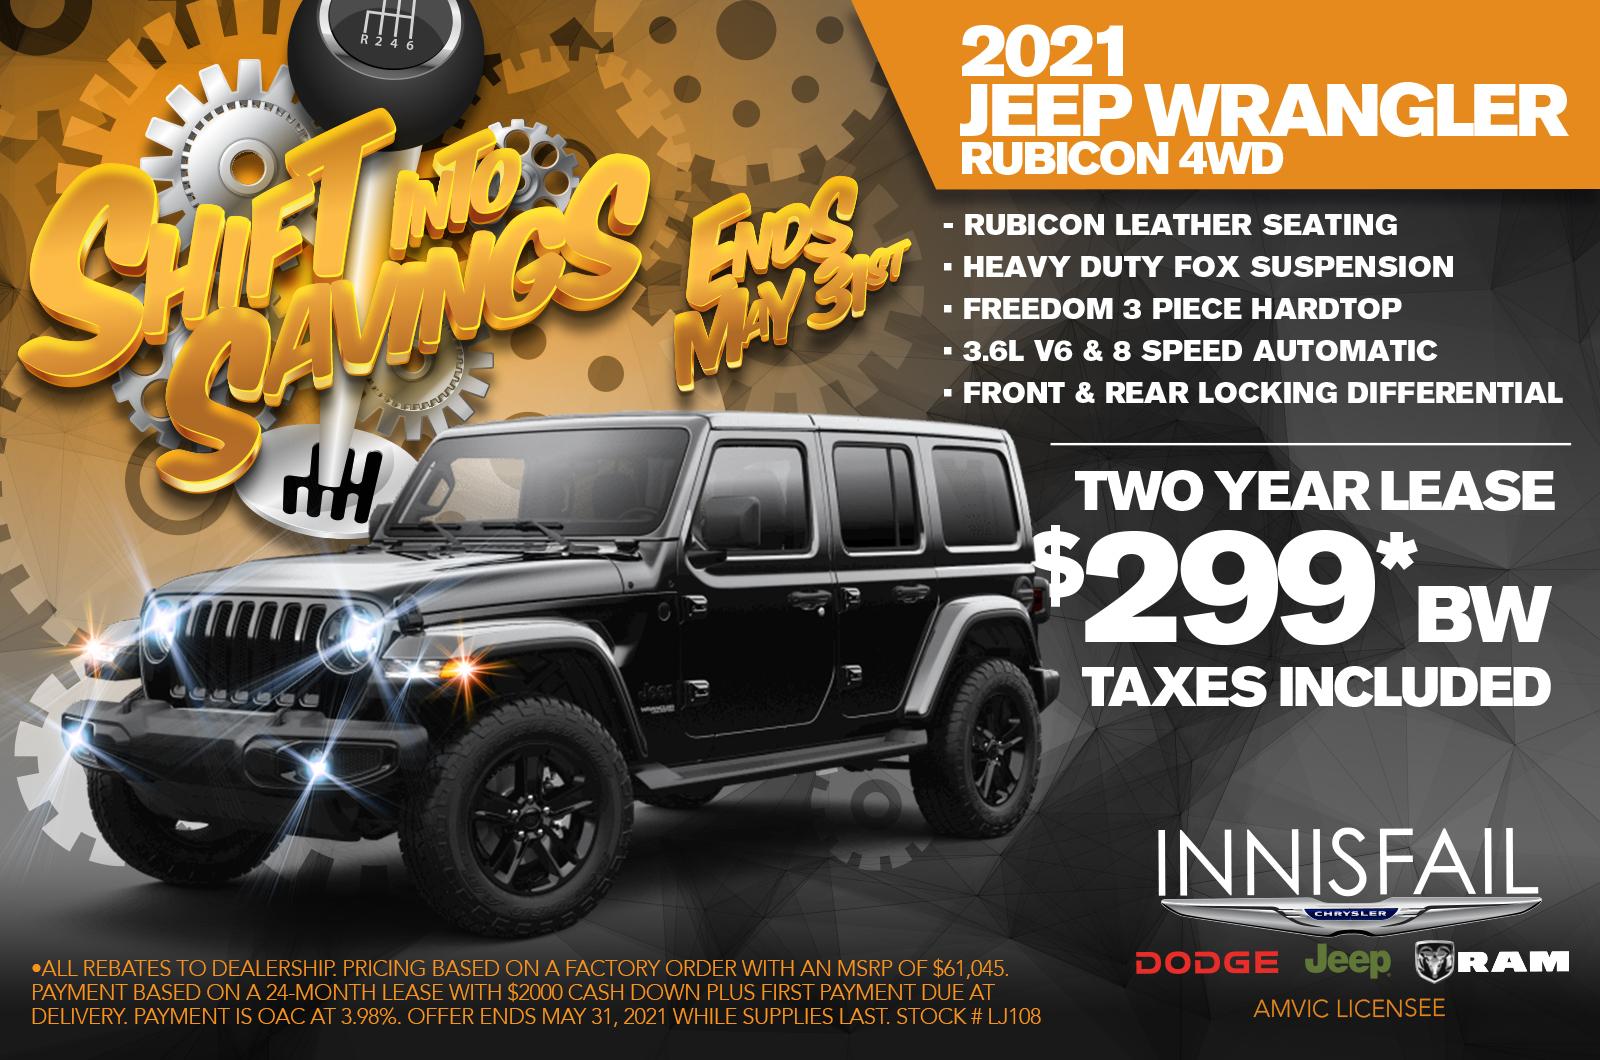 jeep wrangler special image